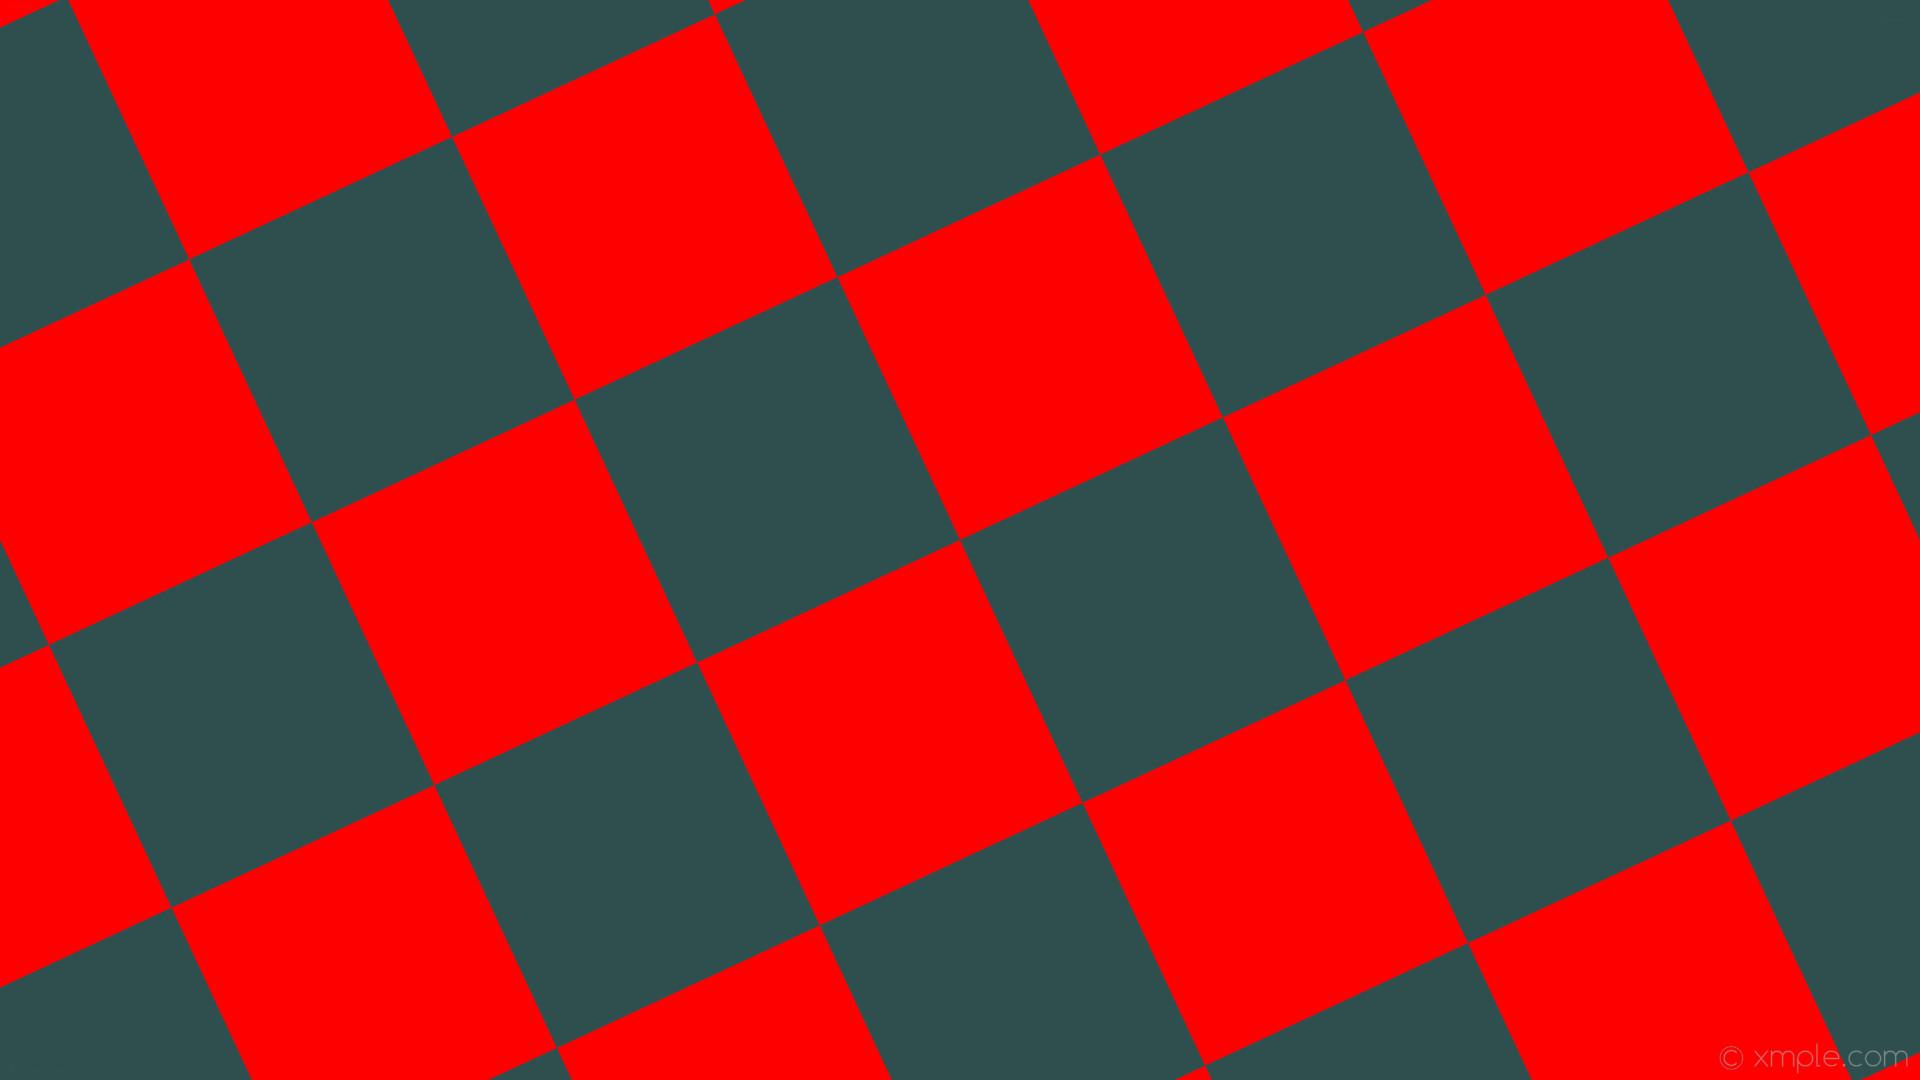 wallpaper checkered grey squares red dark slate gray #2f4f4f #ff0000  diagonal 25° 290px